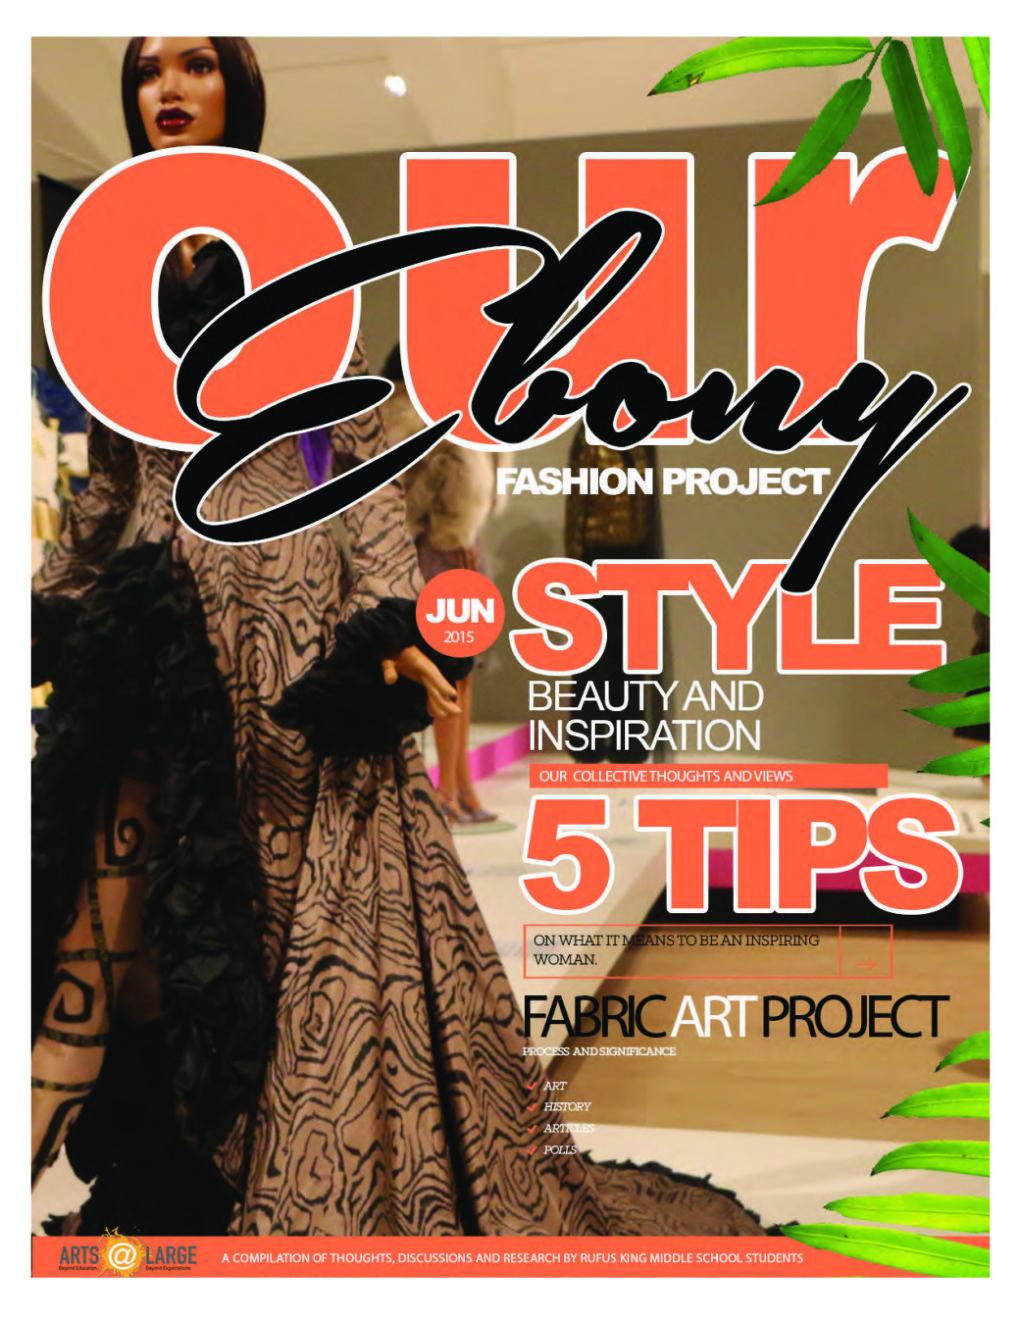 Arts@Large Ebony Fashion Fair Project